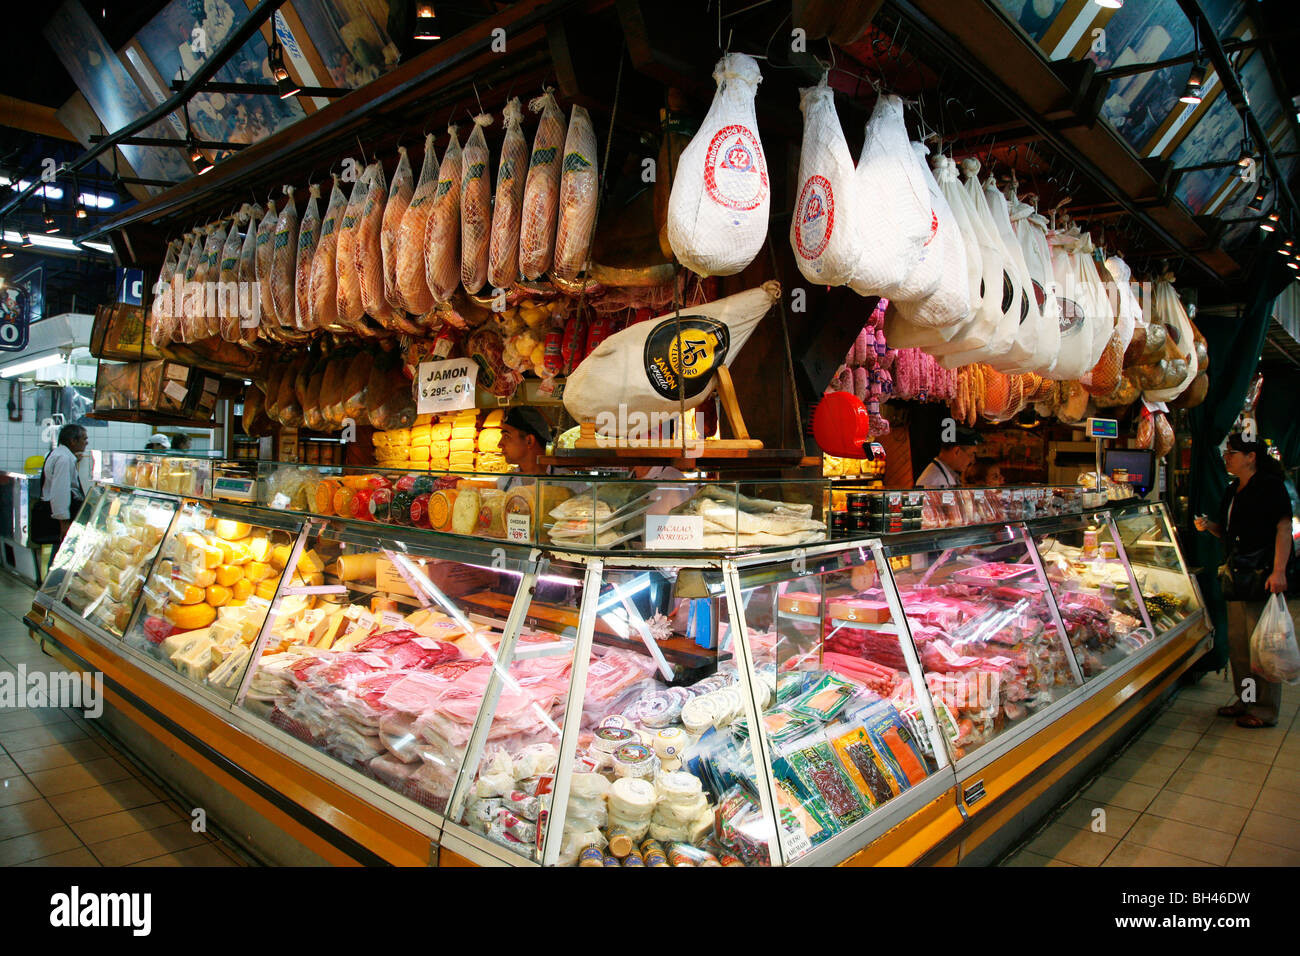 People at Mercado Central the city central market, Mendoza, Argentina. - Stock Image